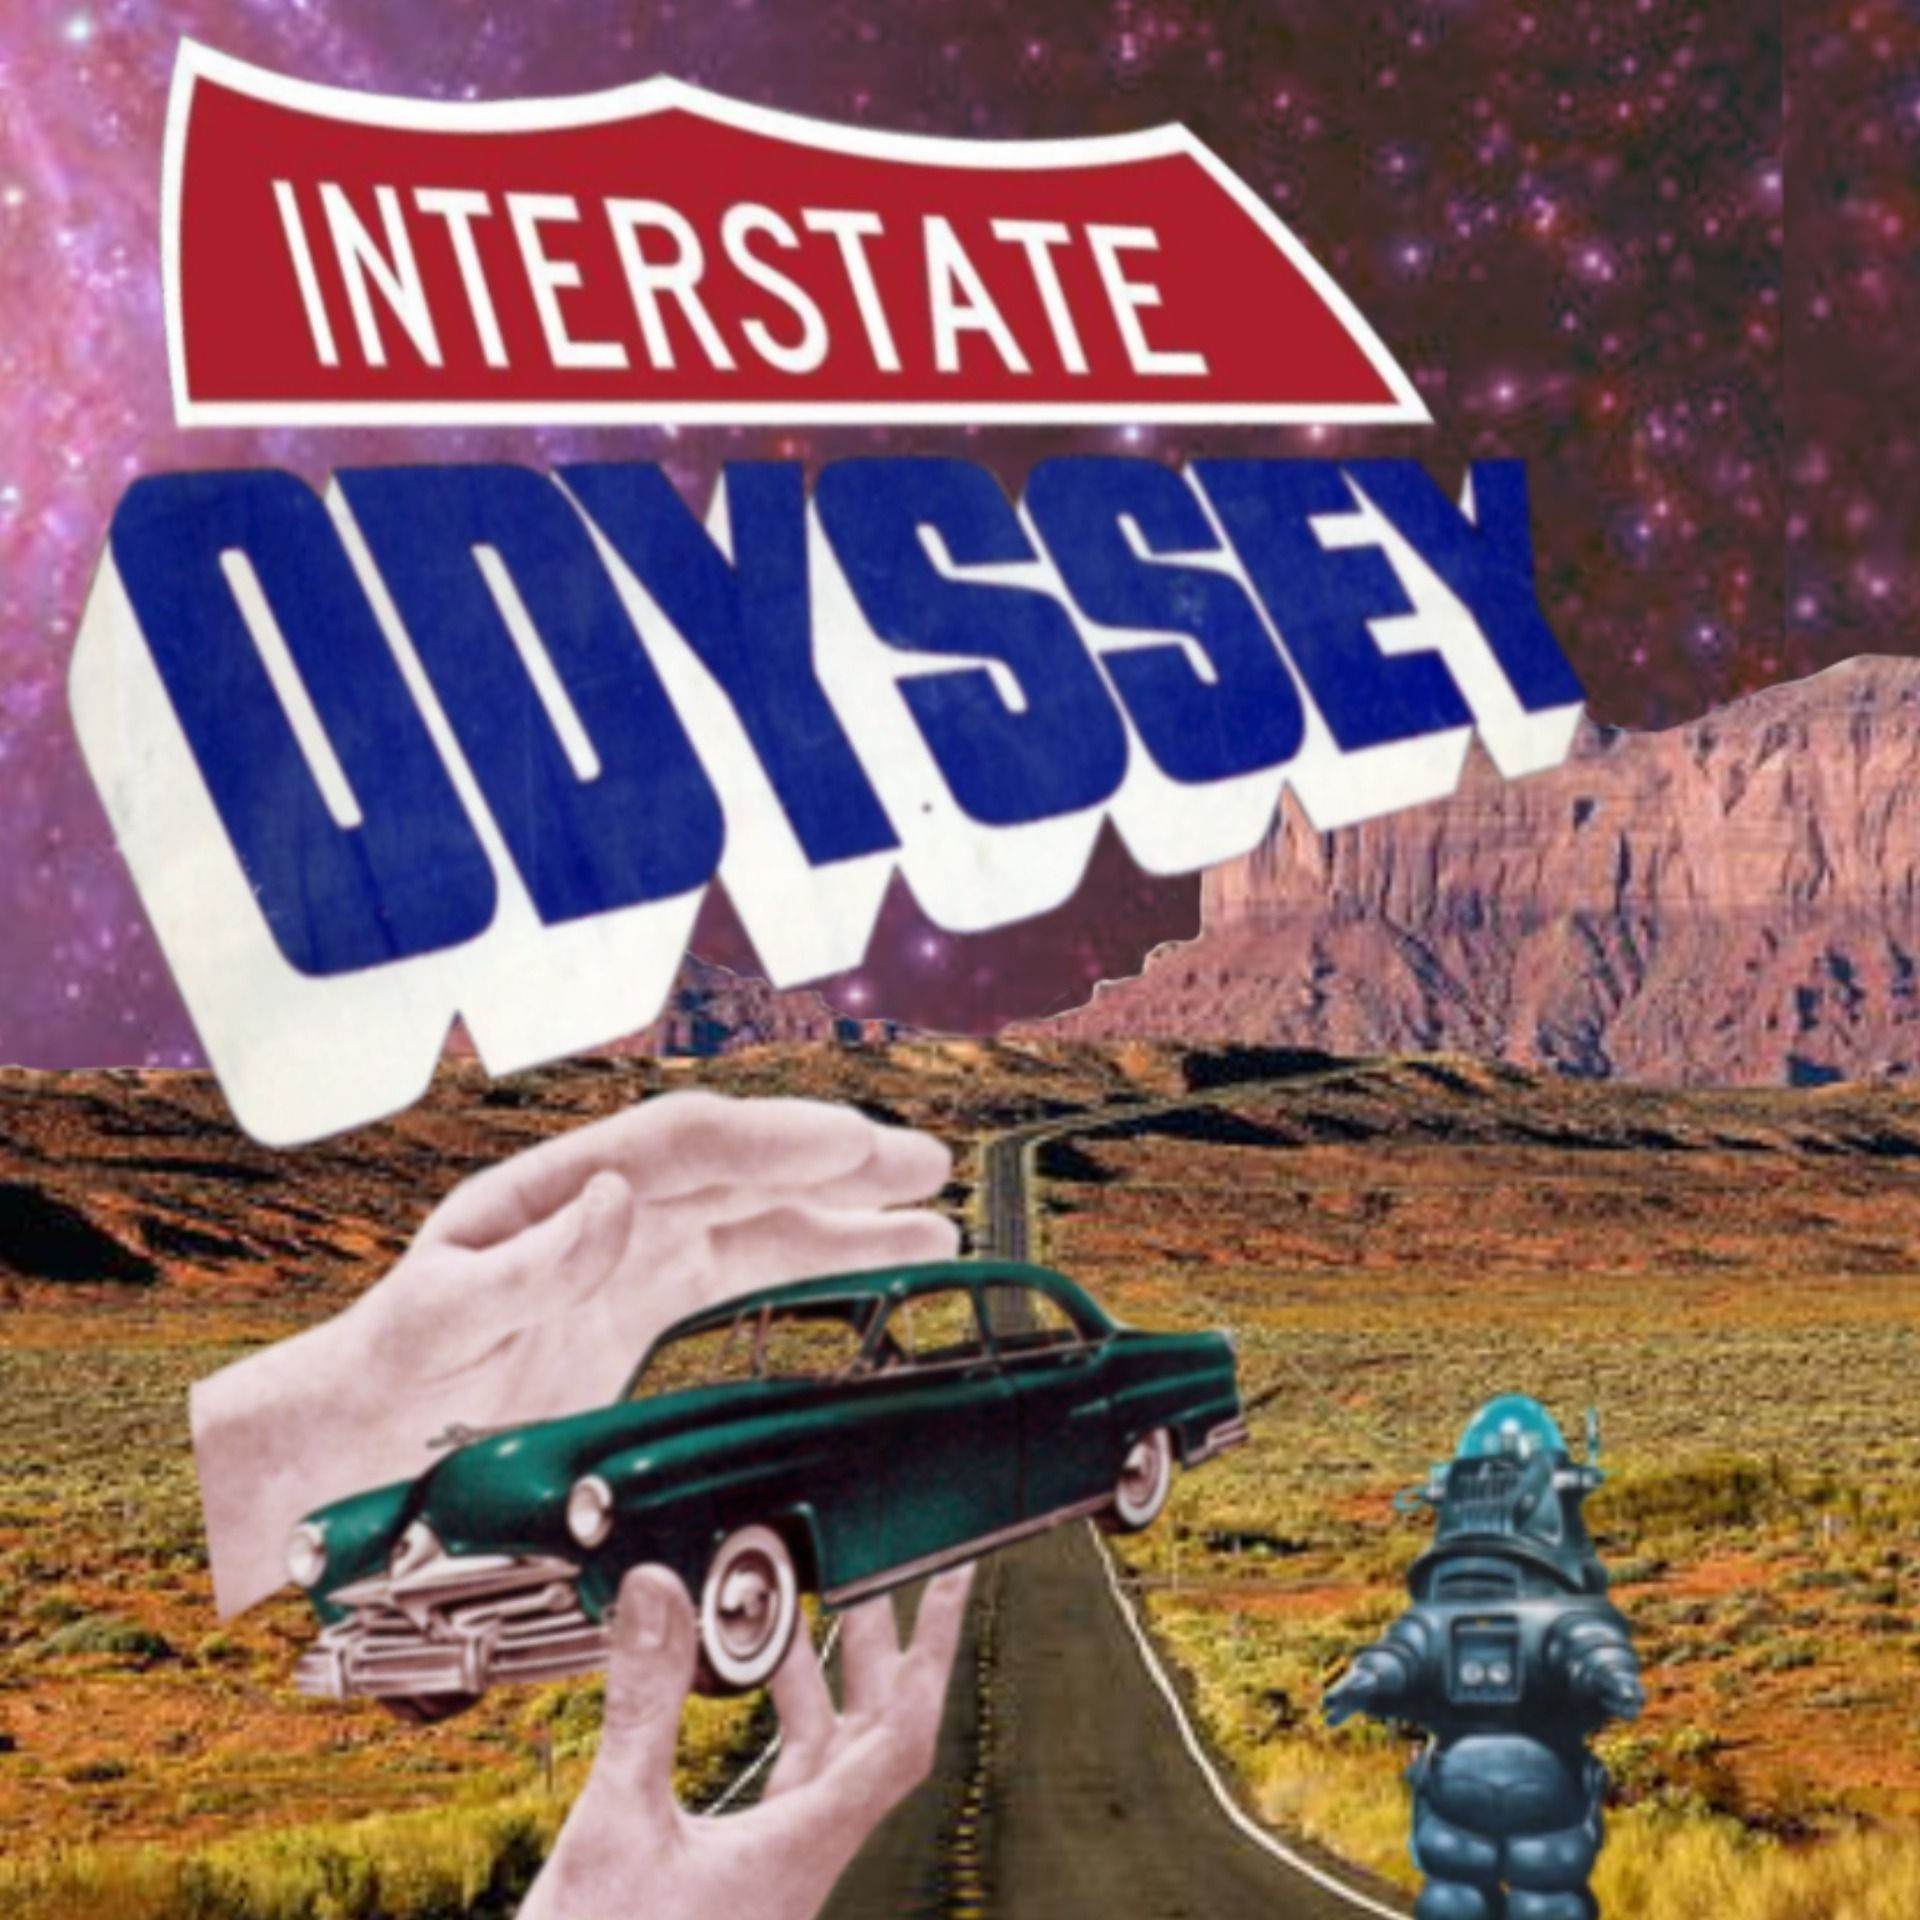 Interstate Odyssey